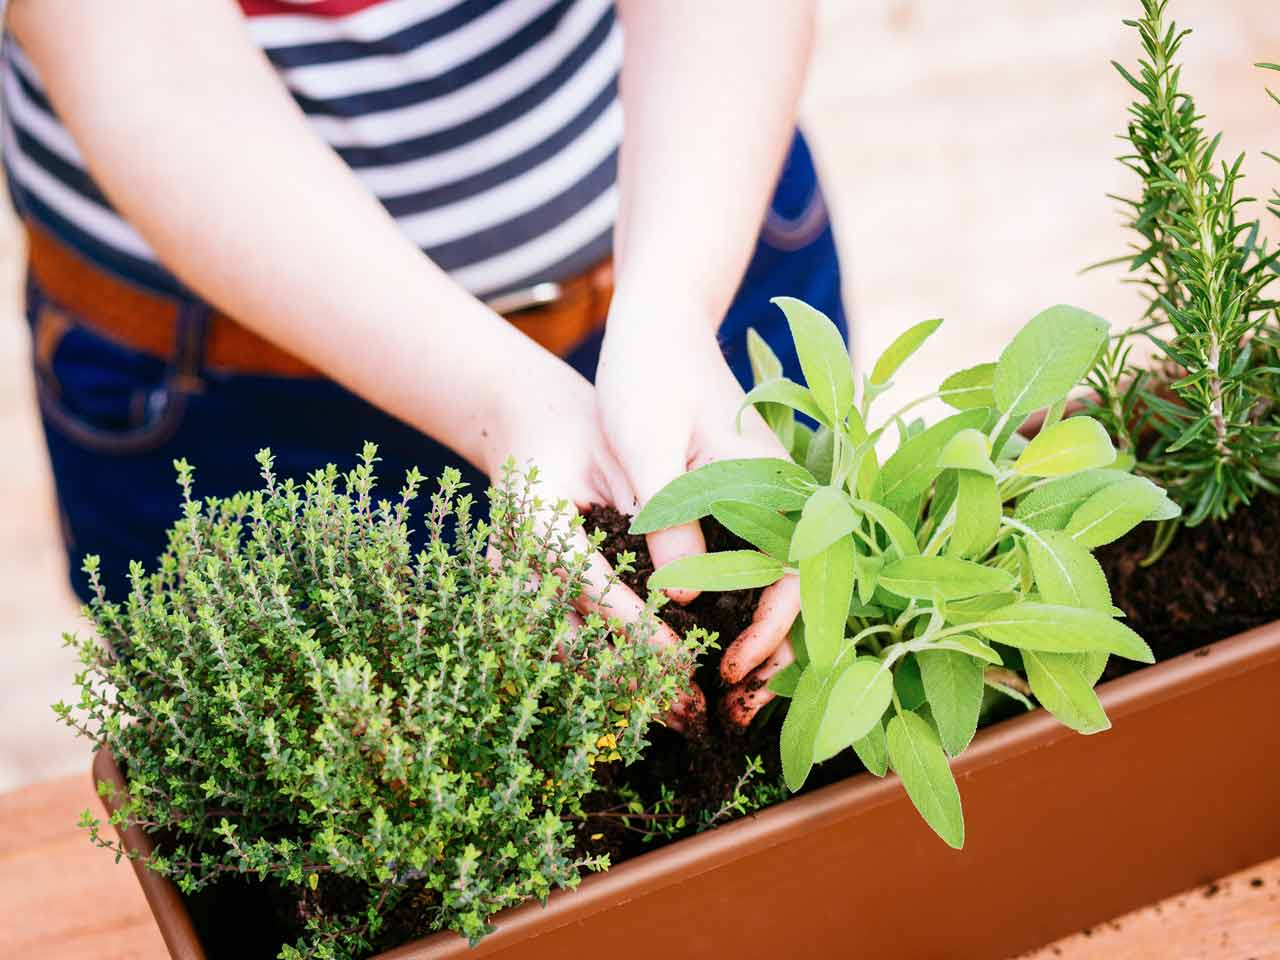 how to grow evergreen herbs  saga, Beautiful flower